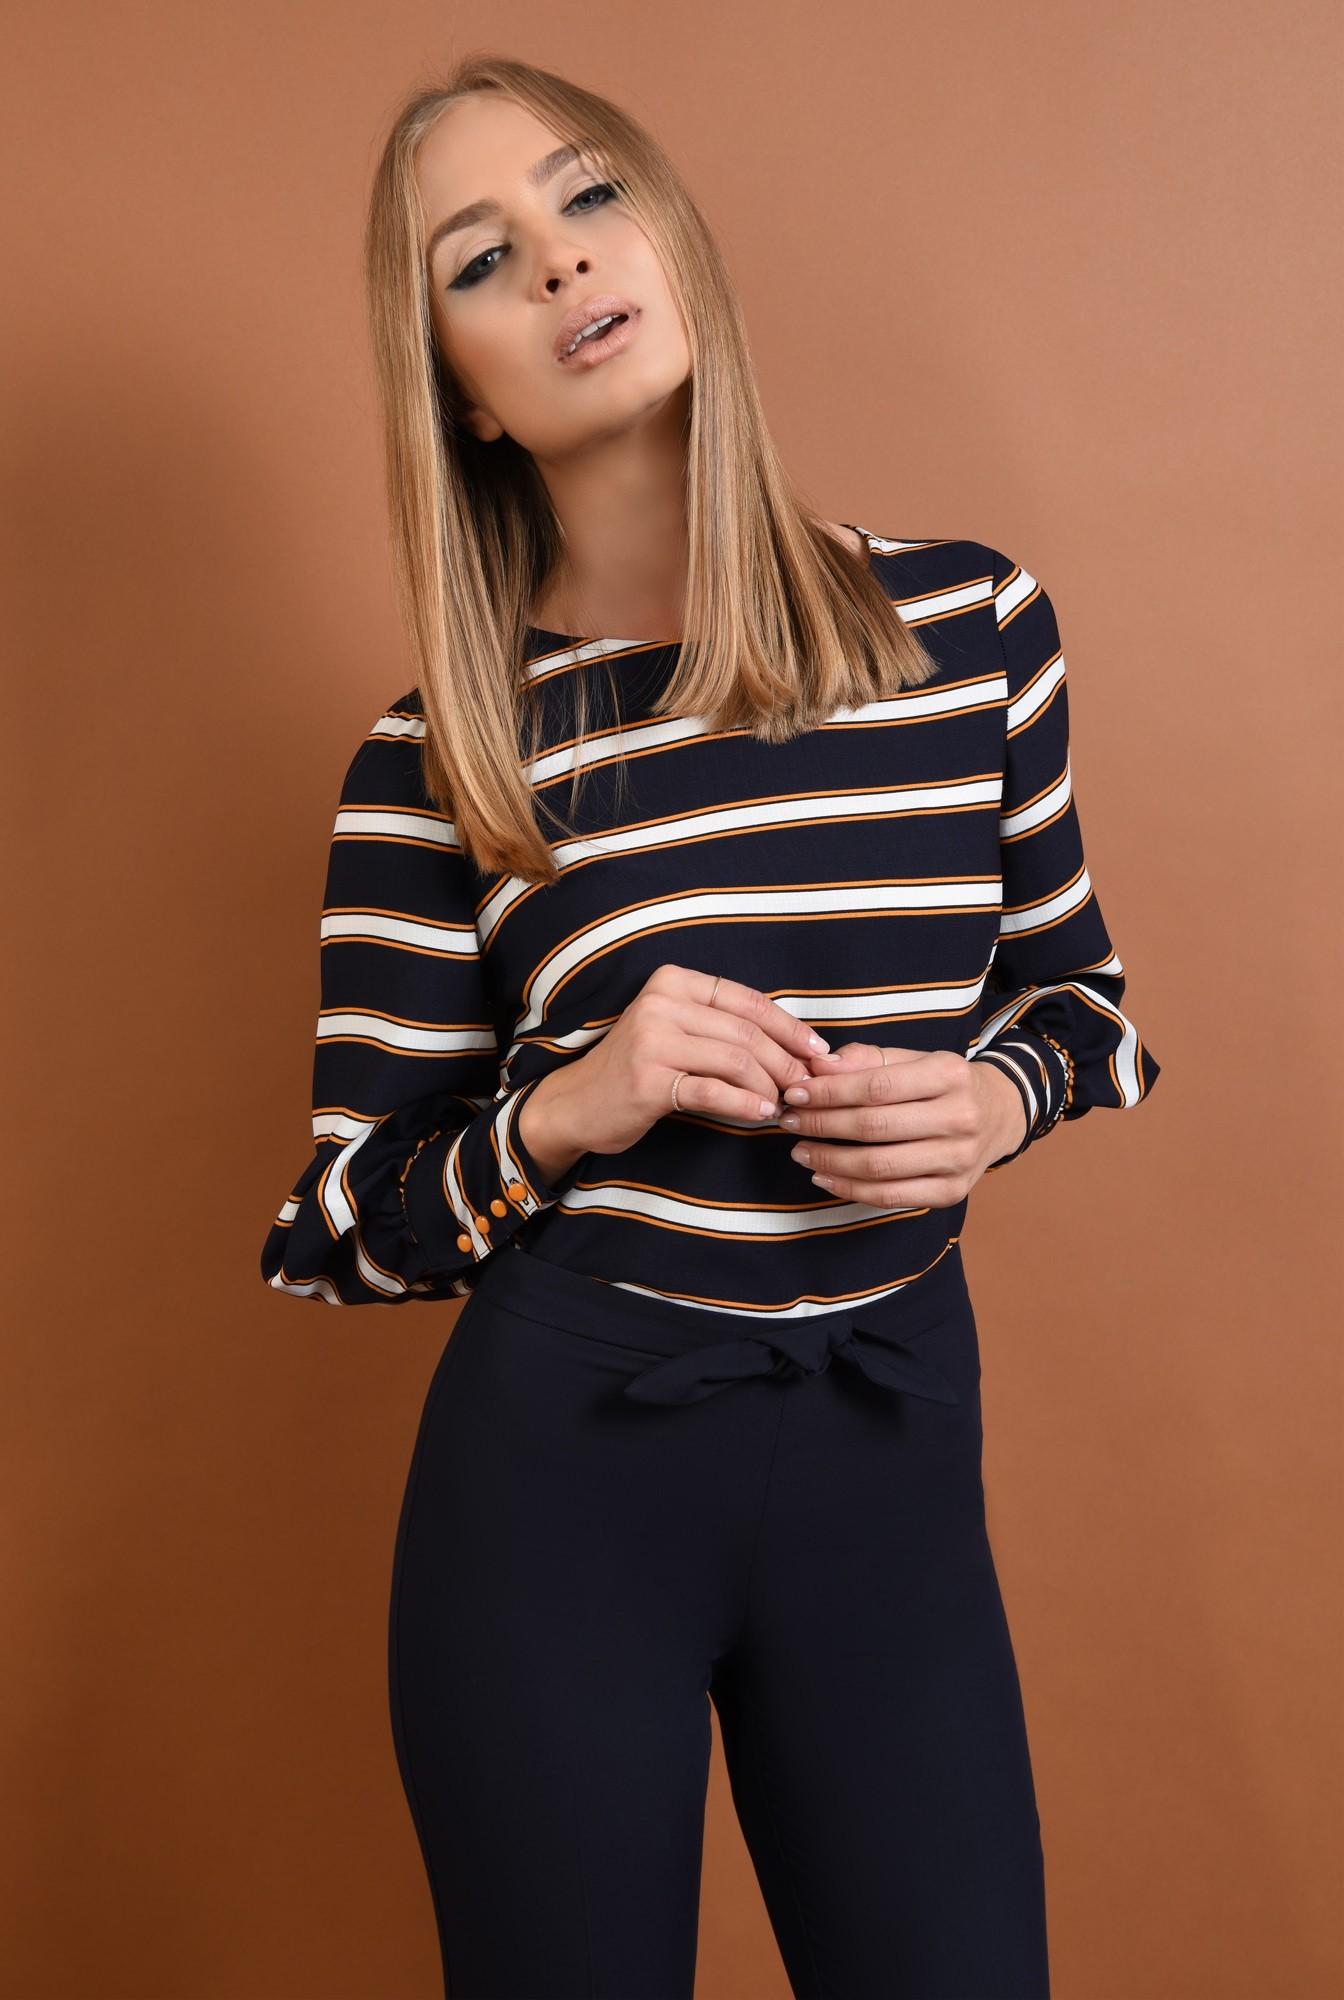 0 - bluze online, tesatura cu dungi, mansete cu 4 nasturi